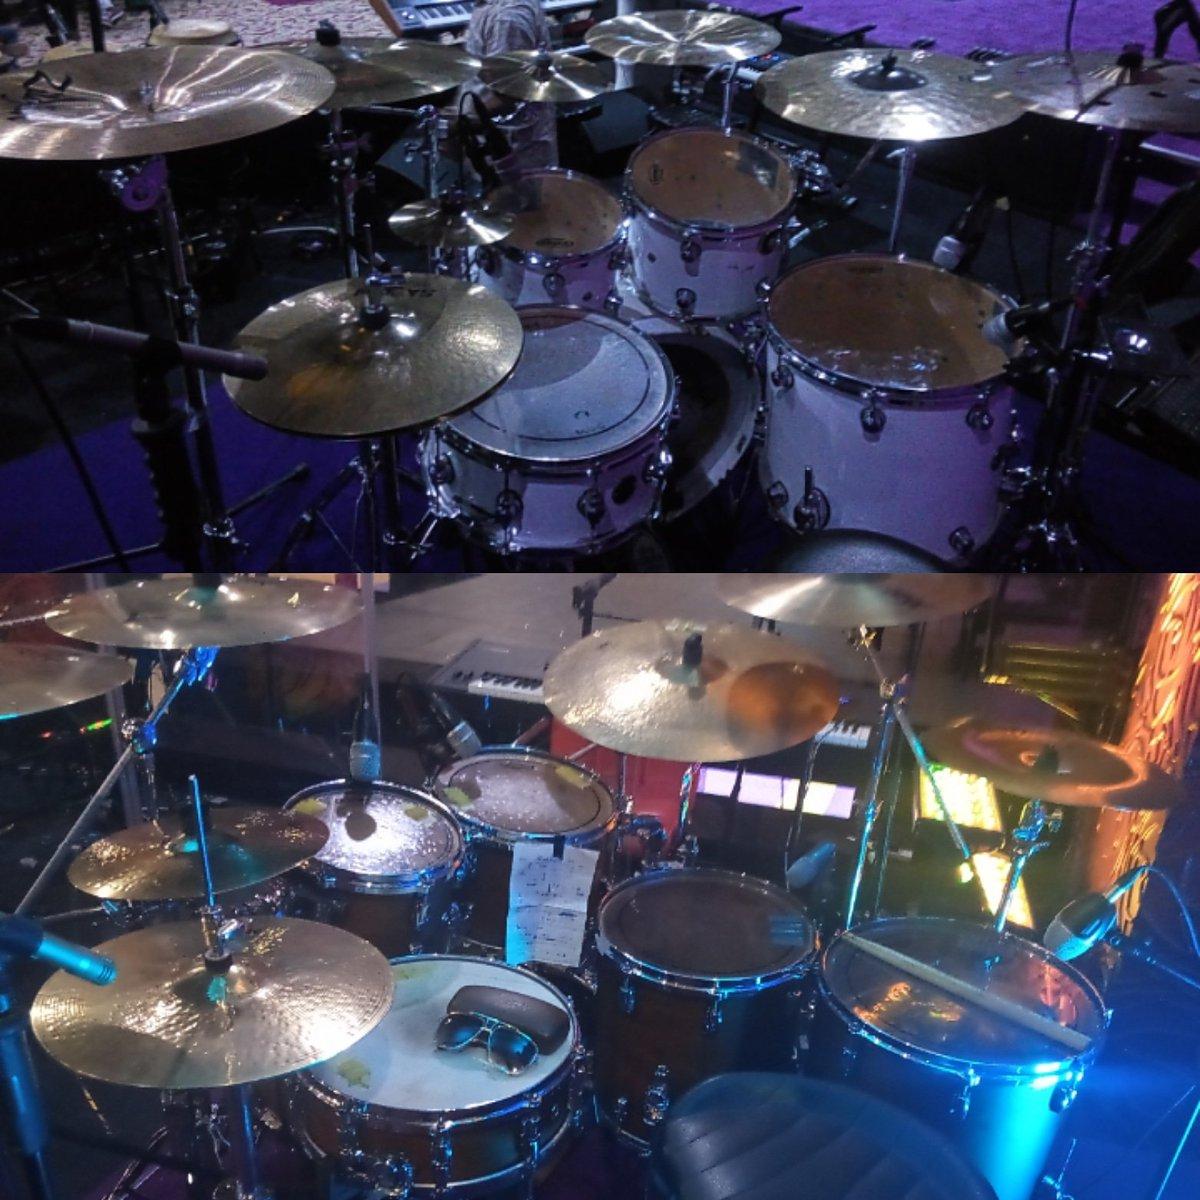 Old Setup Vs New Setup #Dw X #Pearl . . . #drums #drumset #drumlifestyle #drumsdaily #drumlove #drumkit #drumsview #zildjiancymbals #drumming #vicfirth #gospelchops #ValentinesDay2020 #Valentine2020 #ValentineIsComing #drumsticks #dwdrums #Pearldrums #remopercussion #drummerworldpic.twitter.com/vAPNQdUC3W